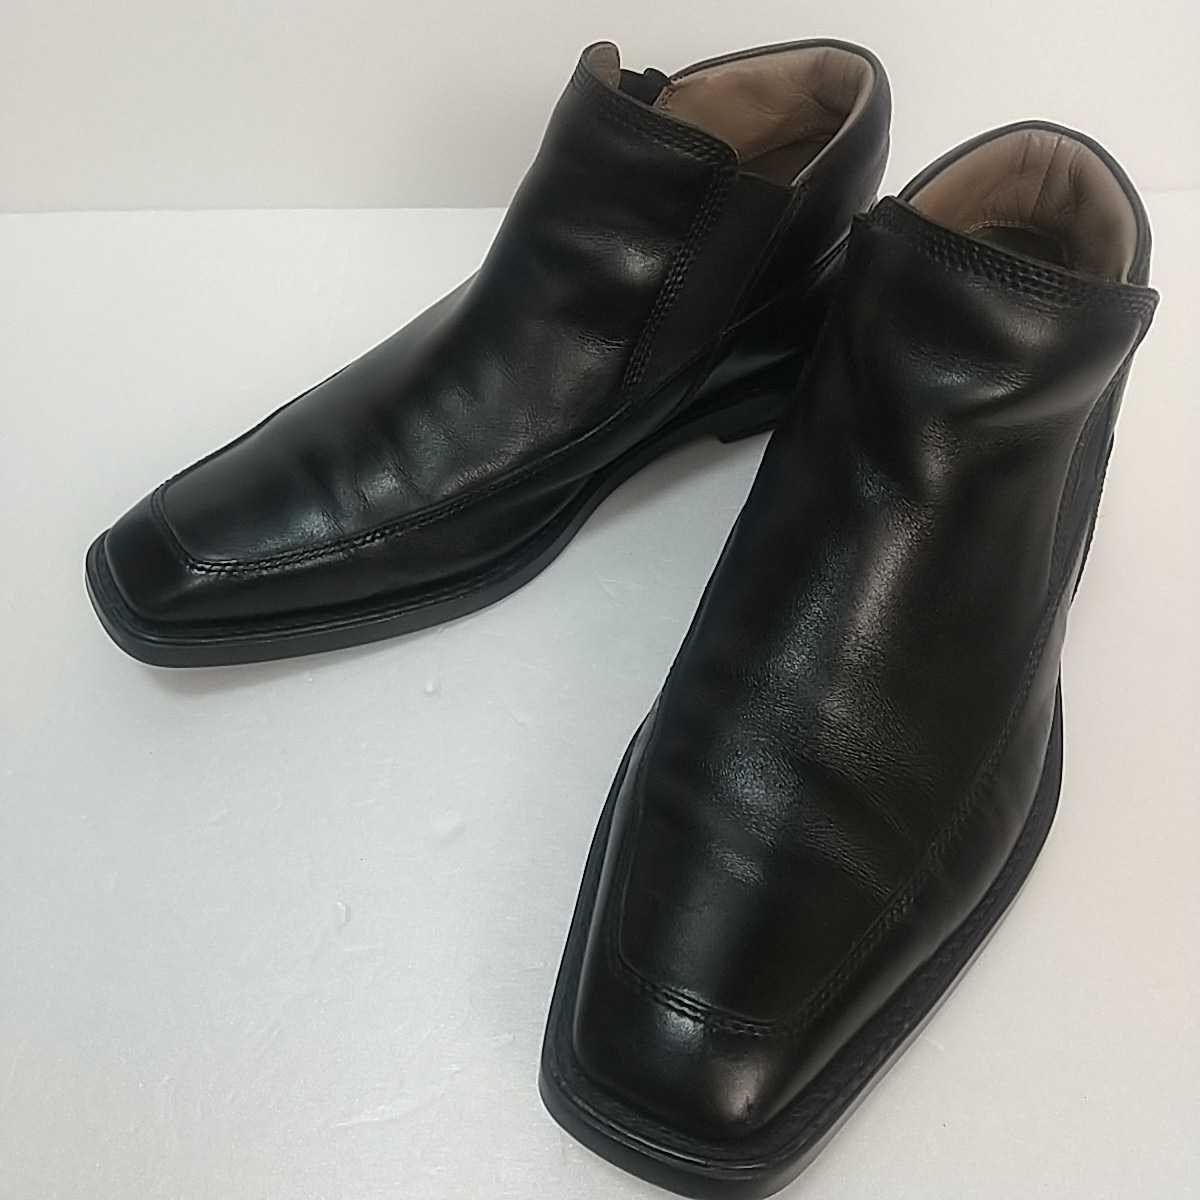 Clarks クラークス レザー サイドゴアブーツ ショート UK9 27.5cm 黒 ブラック 革靴 _画像1